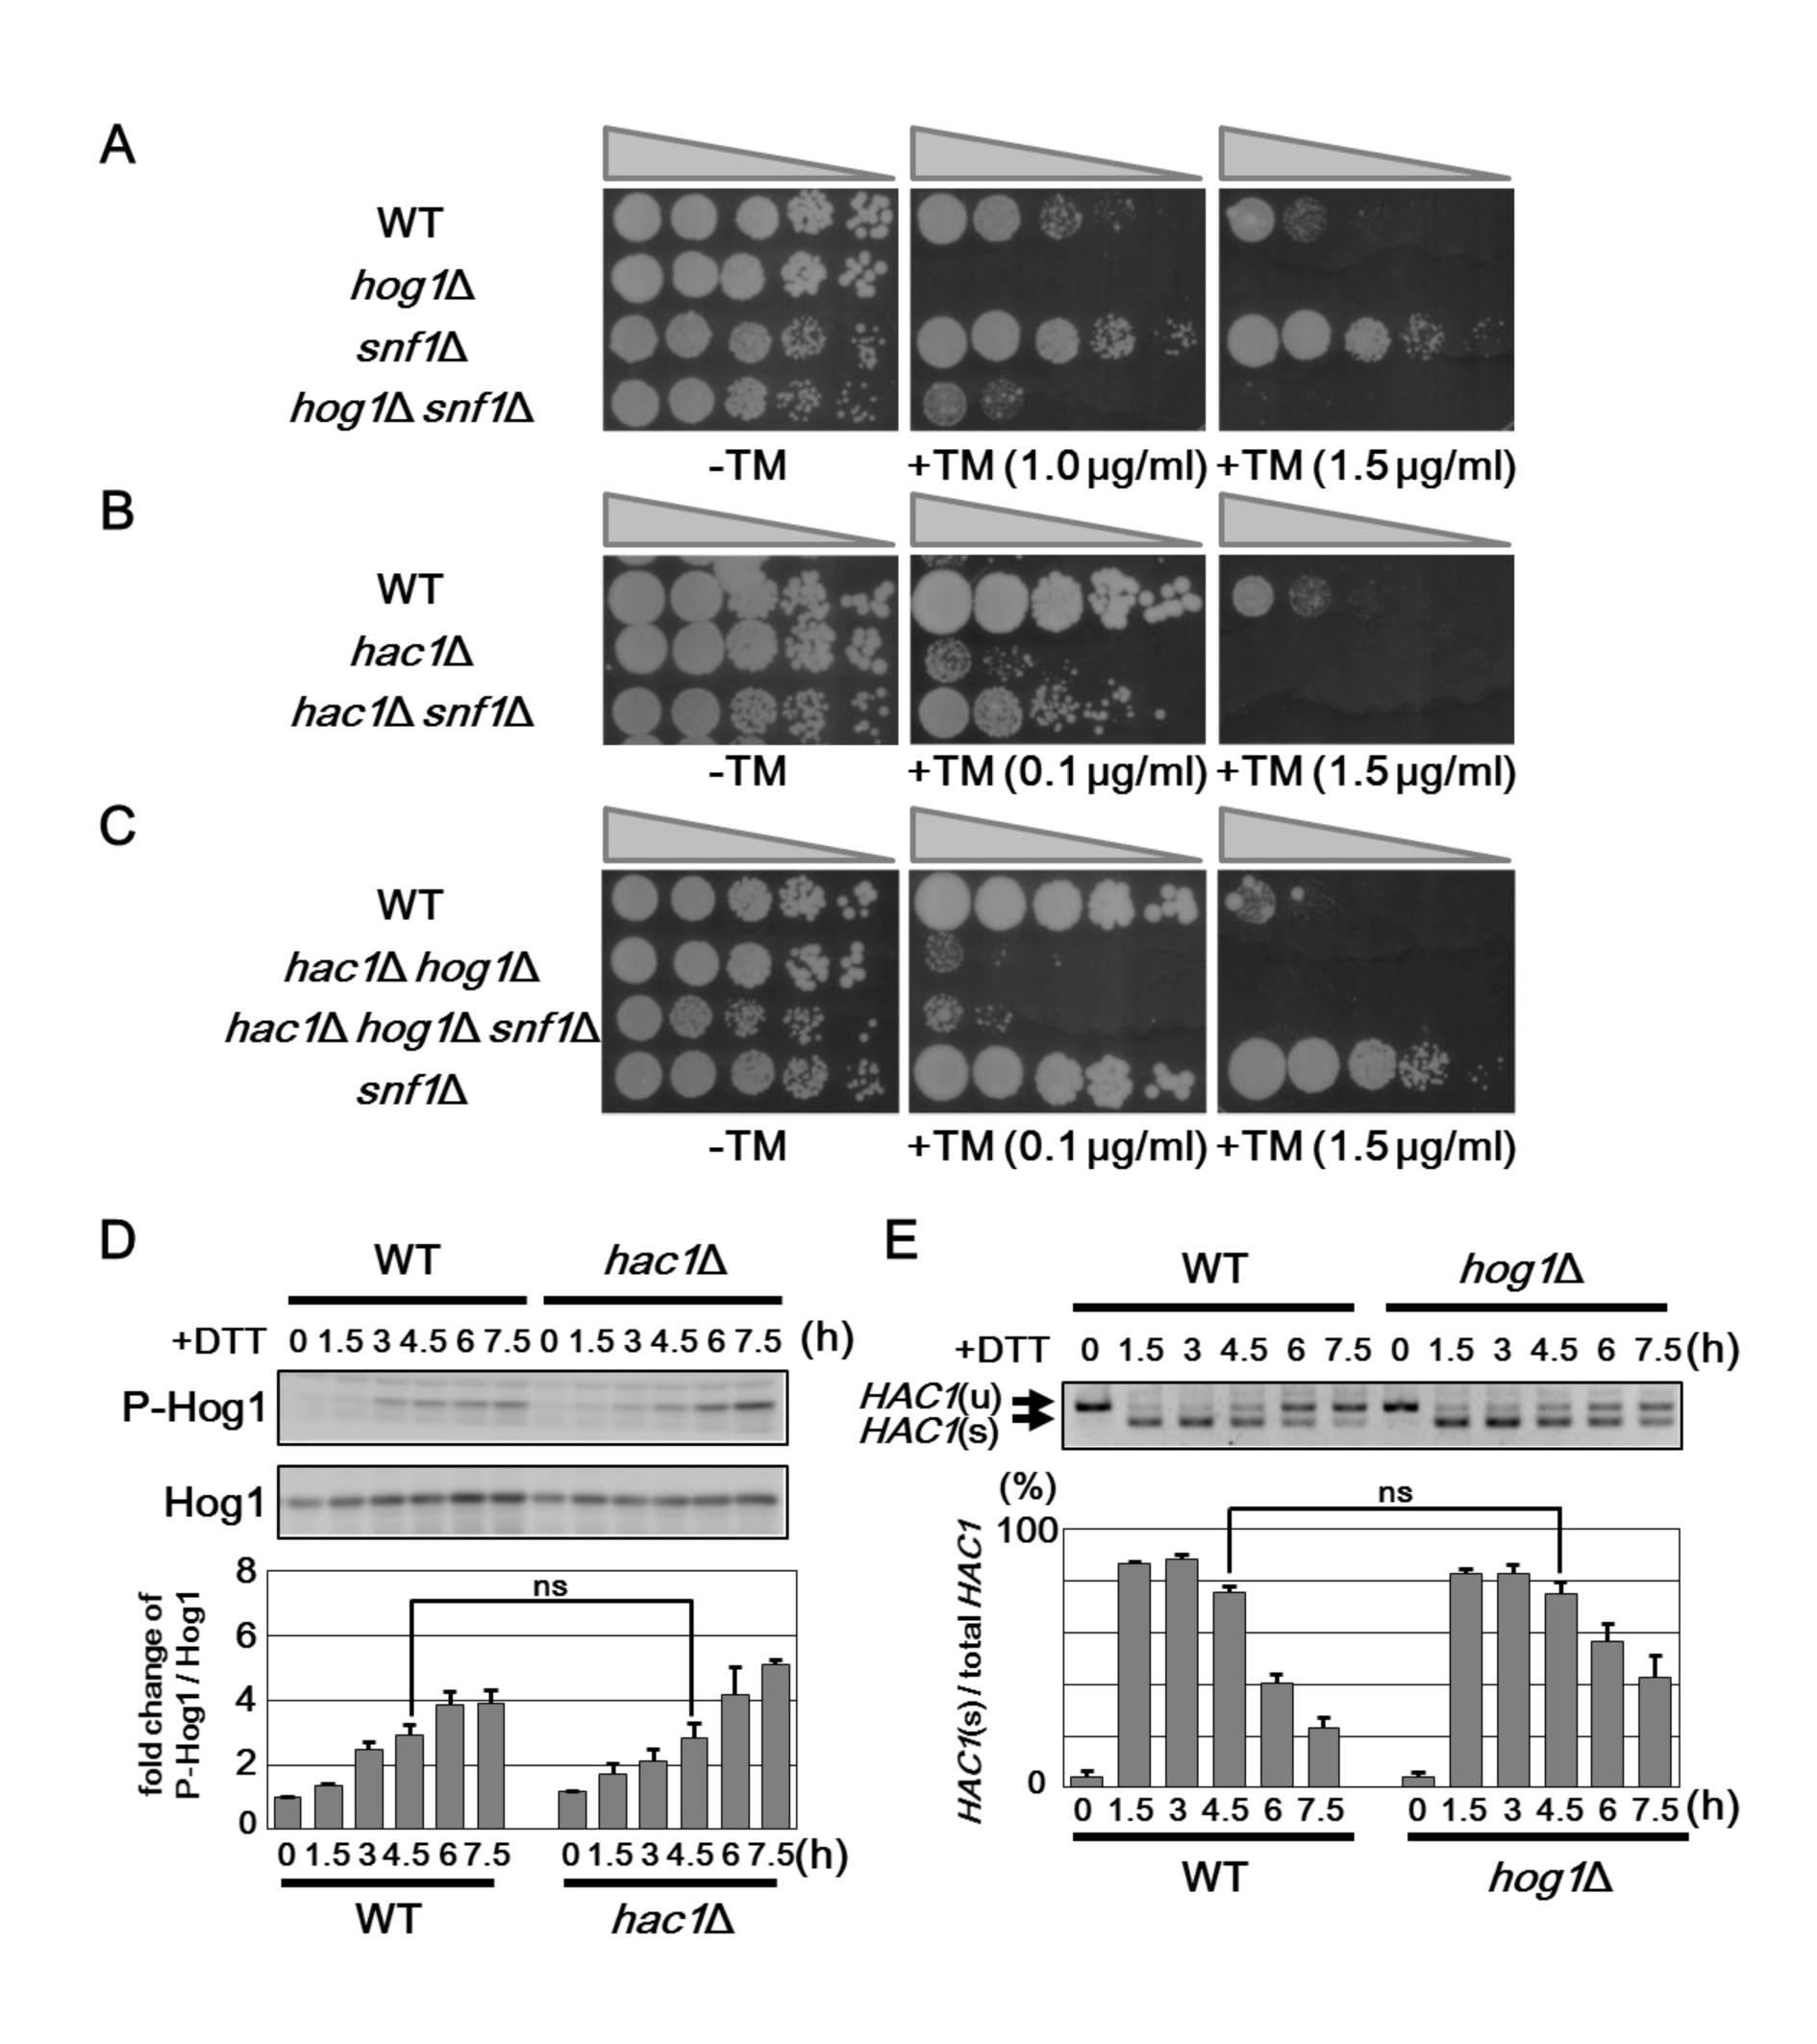 Snf1 regulates ER stress tolerance via Hog1 and UPR.